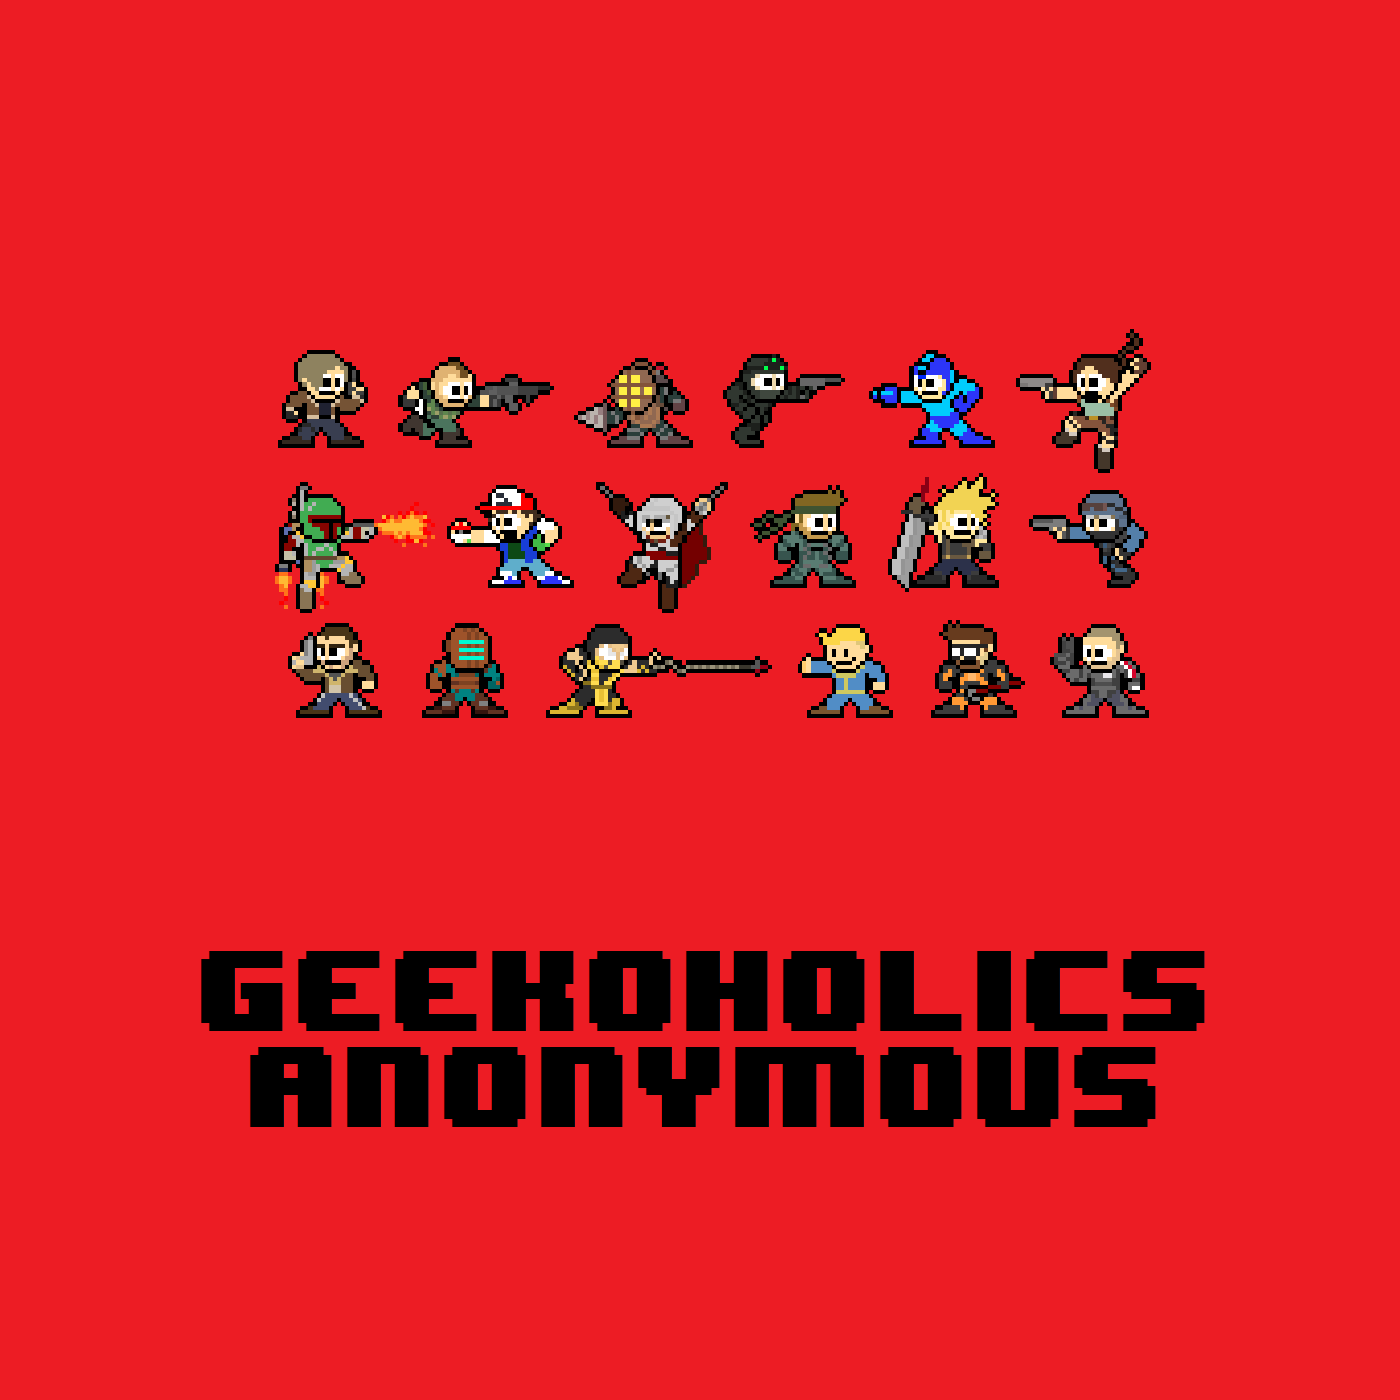 Loki, Returnal, Necromunda, E3, Battlefield 2042 and more - Geekoholics Anonymous Podcast 309 show art